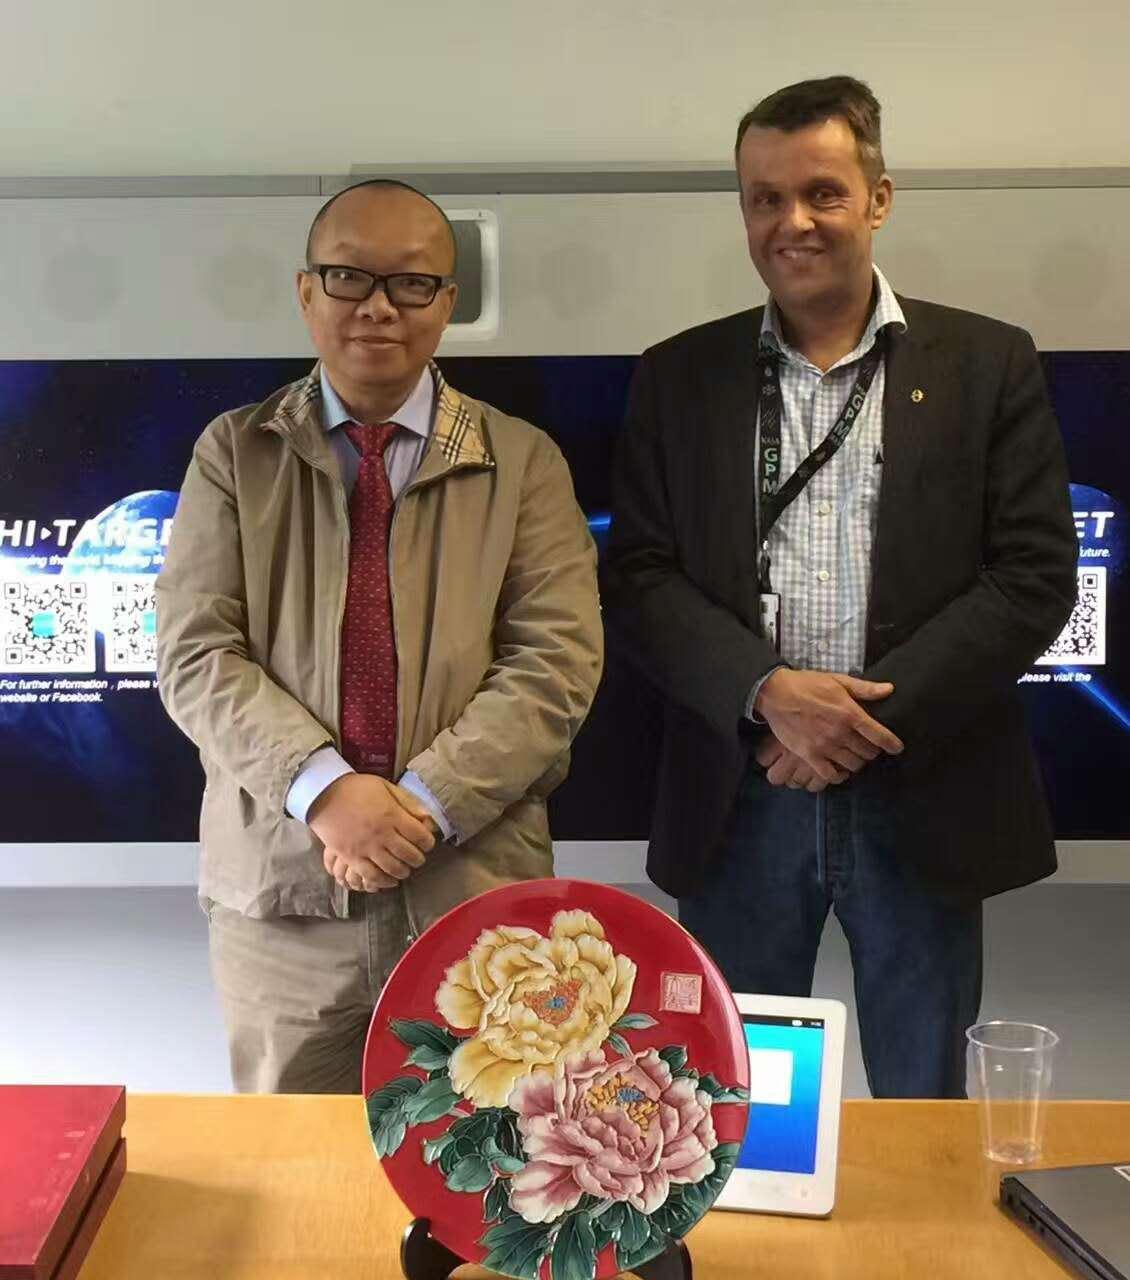 2017060702271557 - A visit to FGI, explore a future cooperation